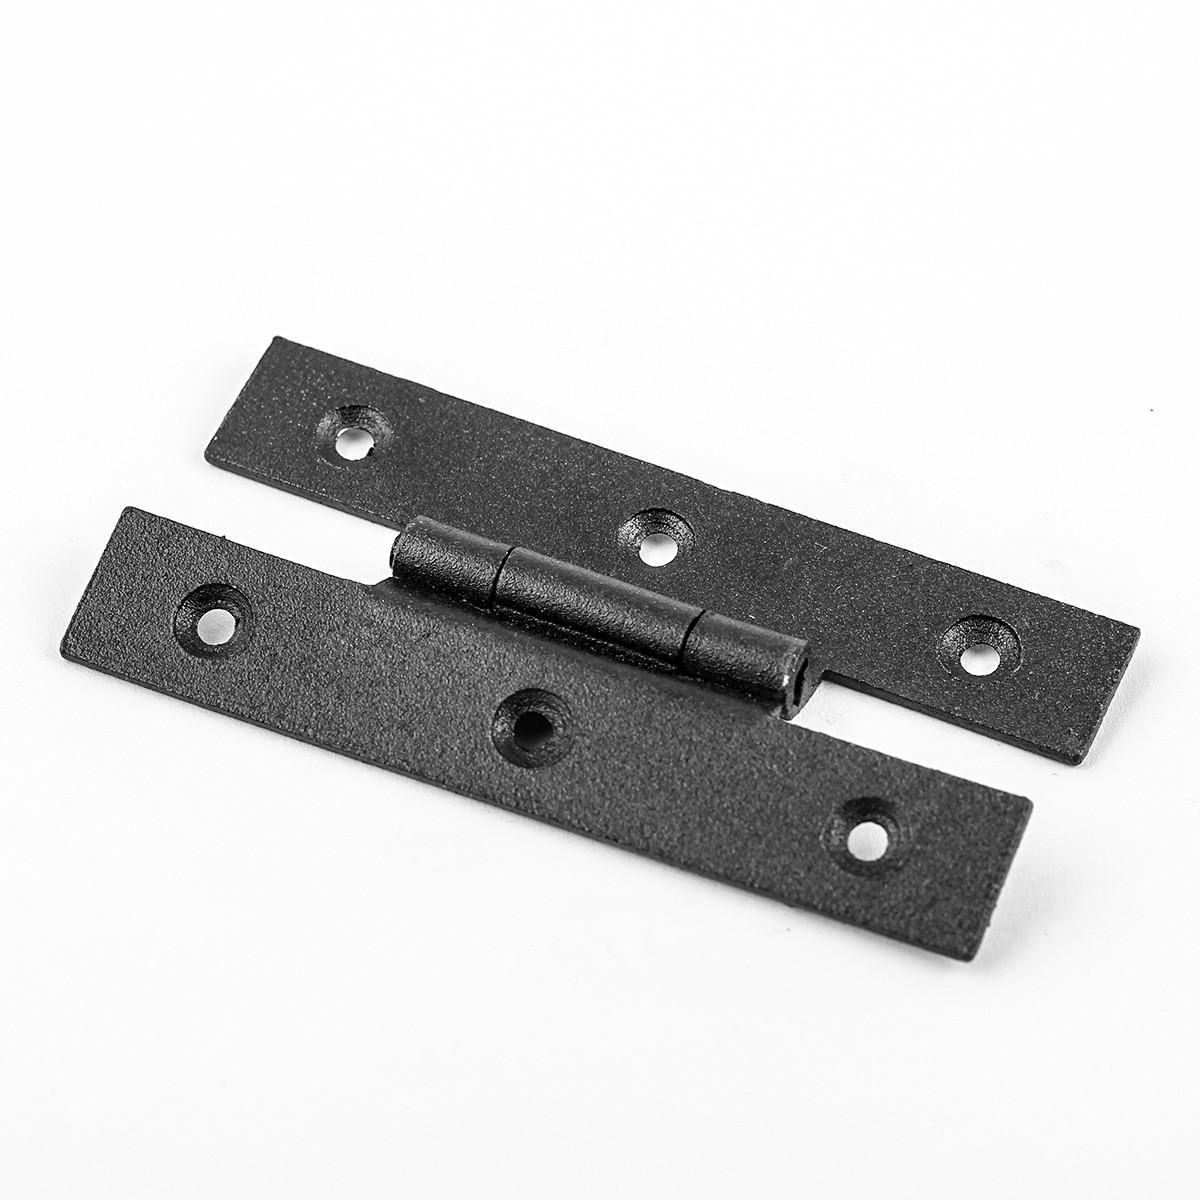 Forged Iron Cabinet Hinge H Style  3.12 H w Offset Door Hinges Door Hinge Solid Brass Hinge